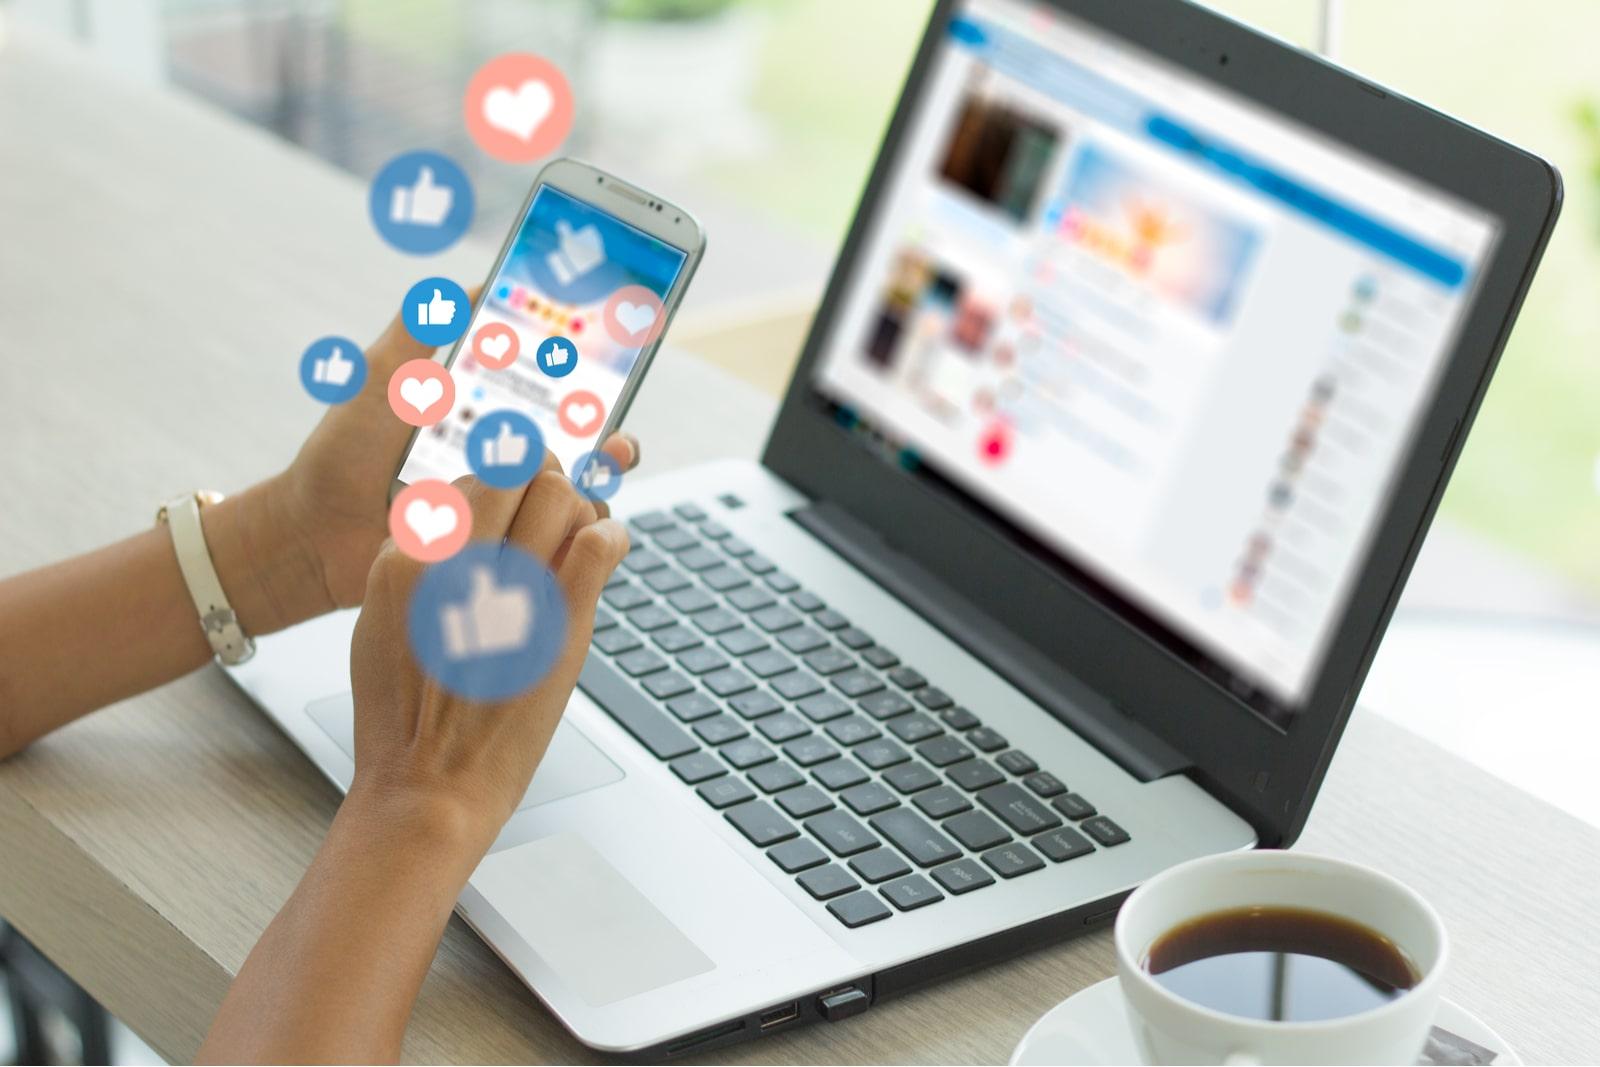 Reklama na Facebooku – zaawansowane targetowanie reklam